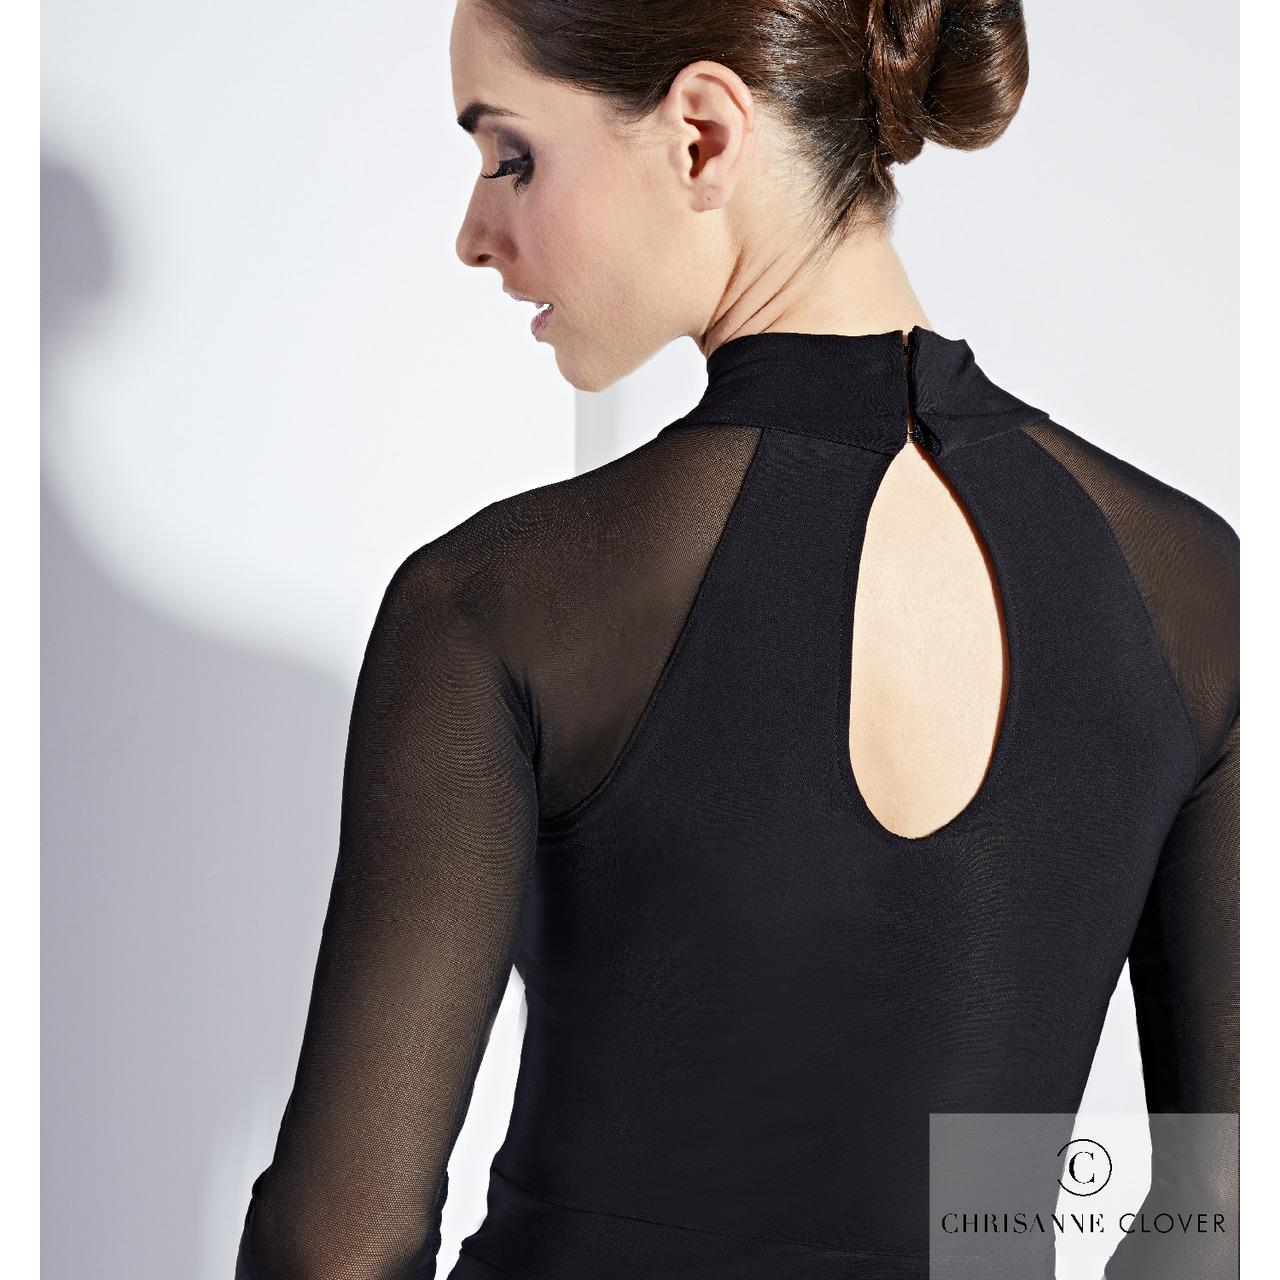 RAPTURE LATIN DRESS ( LA Платье/ Аргентинское танго)